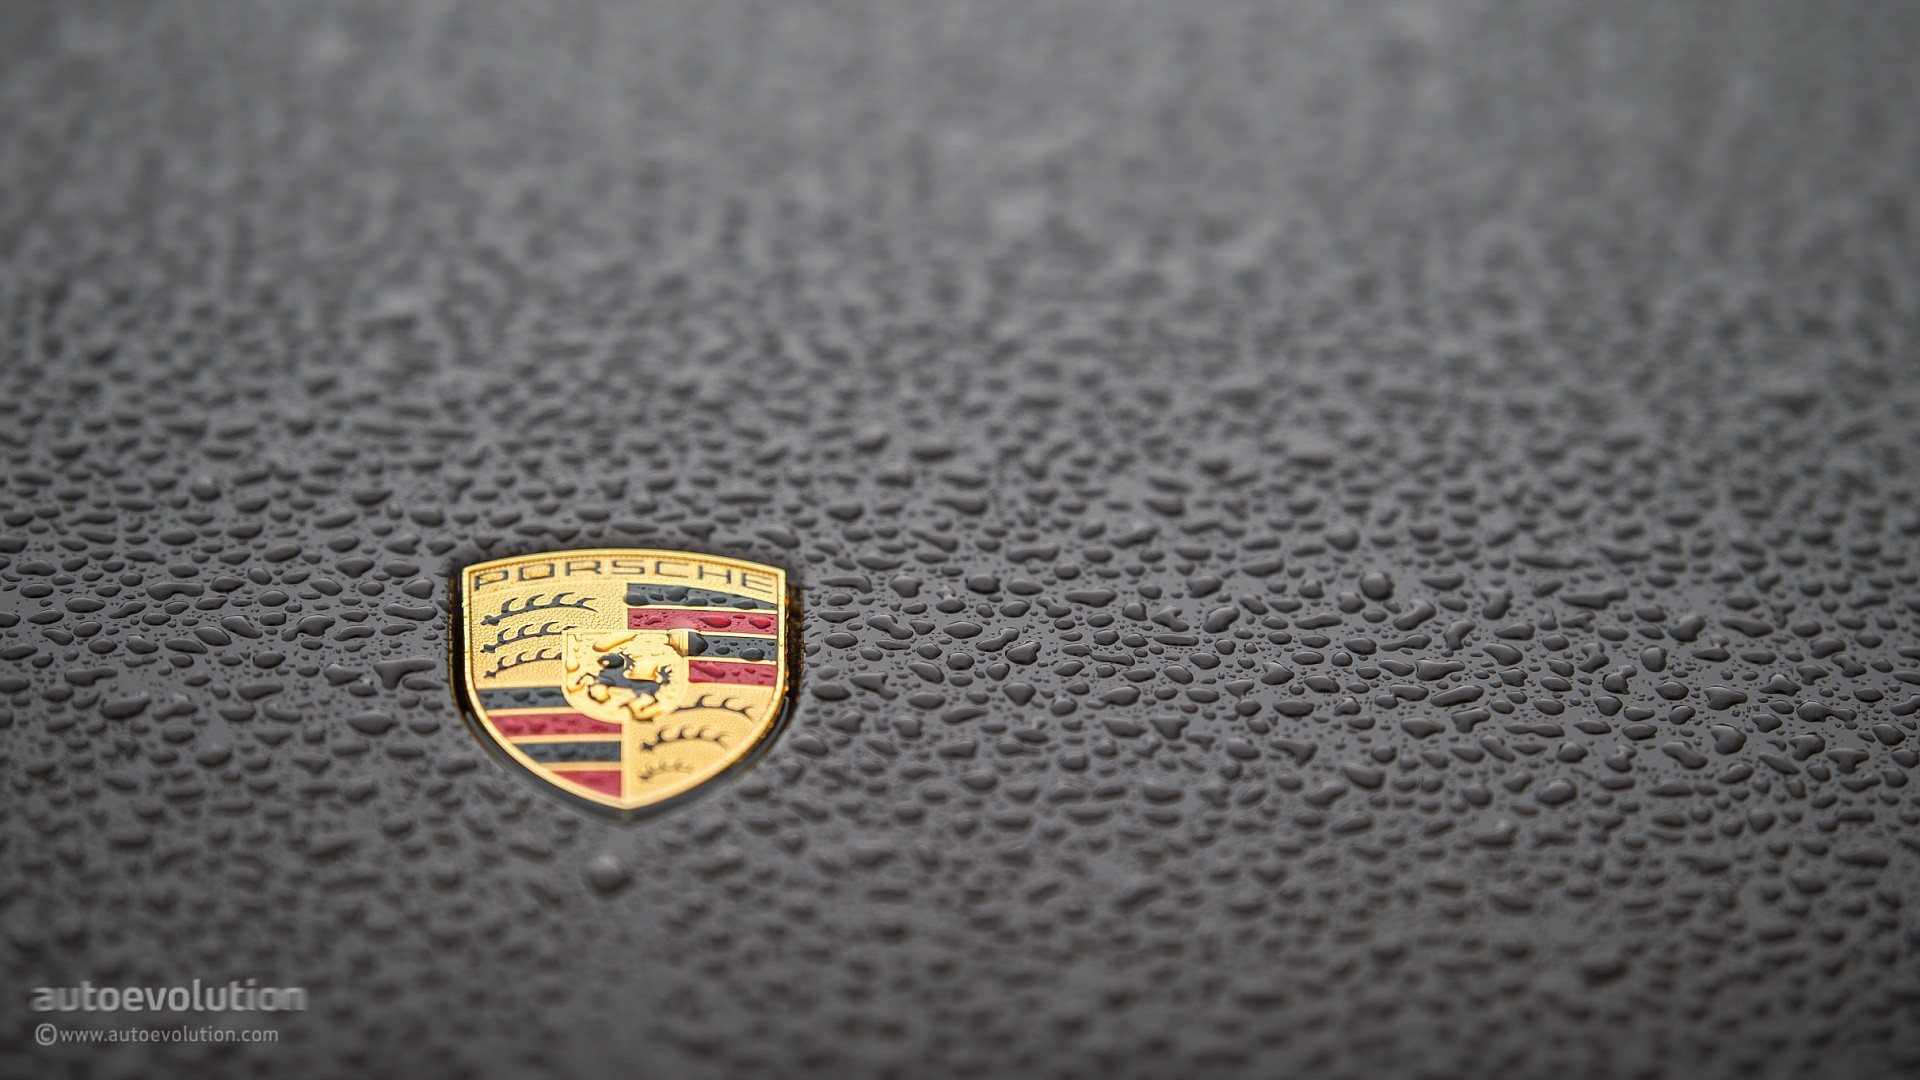 2015 Porsche Cayenne Hd Wallpapers Subtle Giant